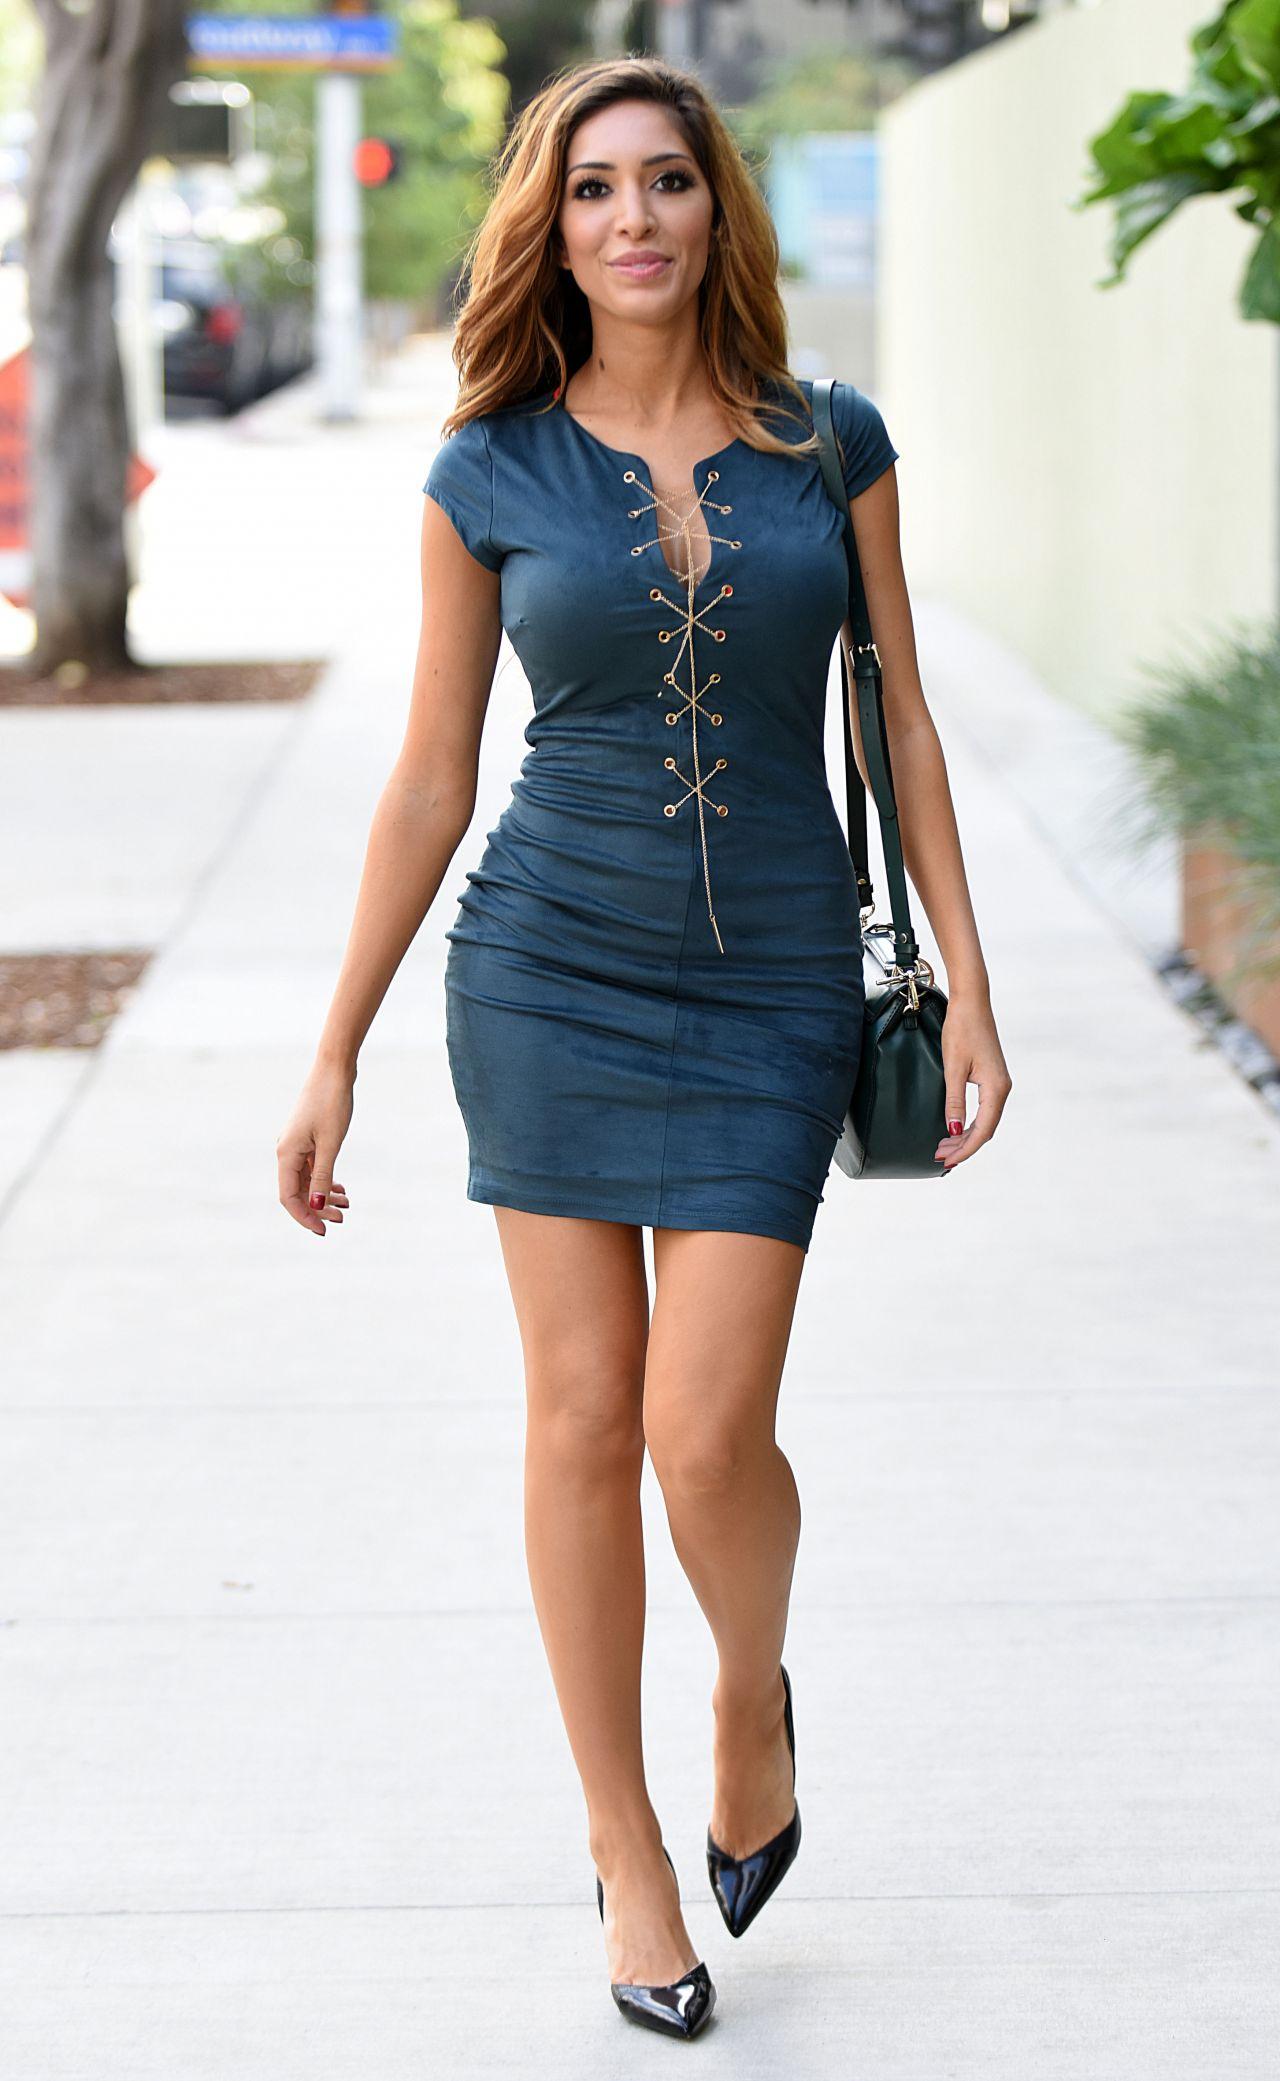 Celebrity Birthday Style - What Celebrities Wear on Their ...